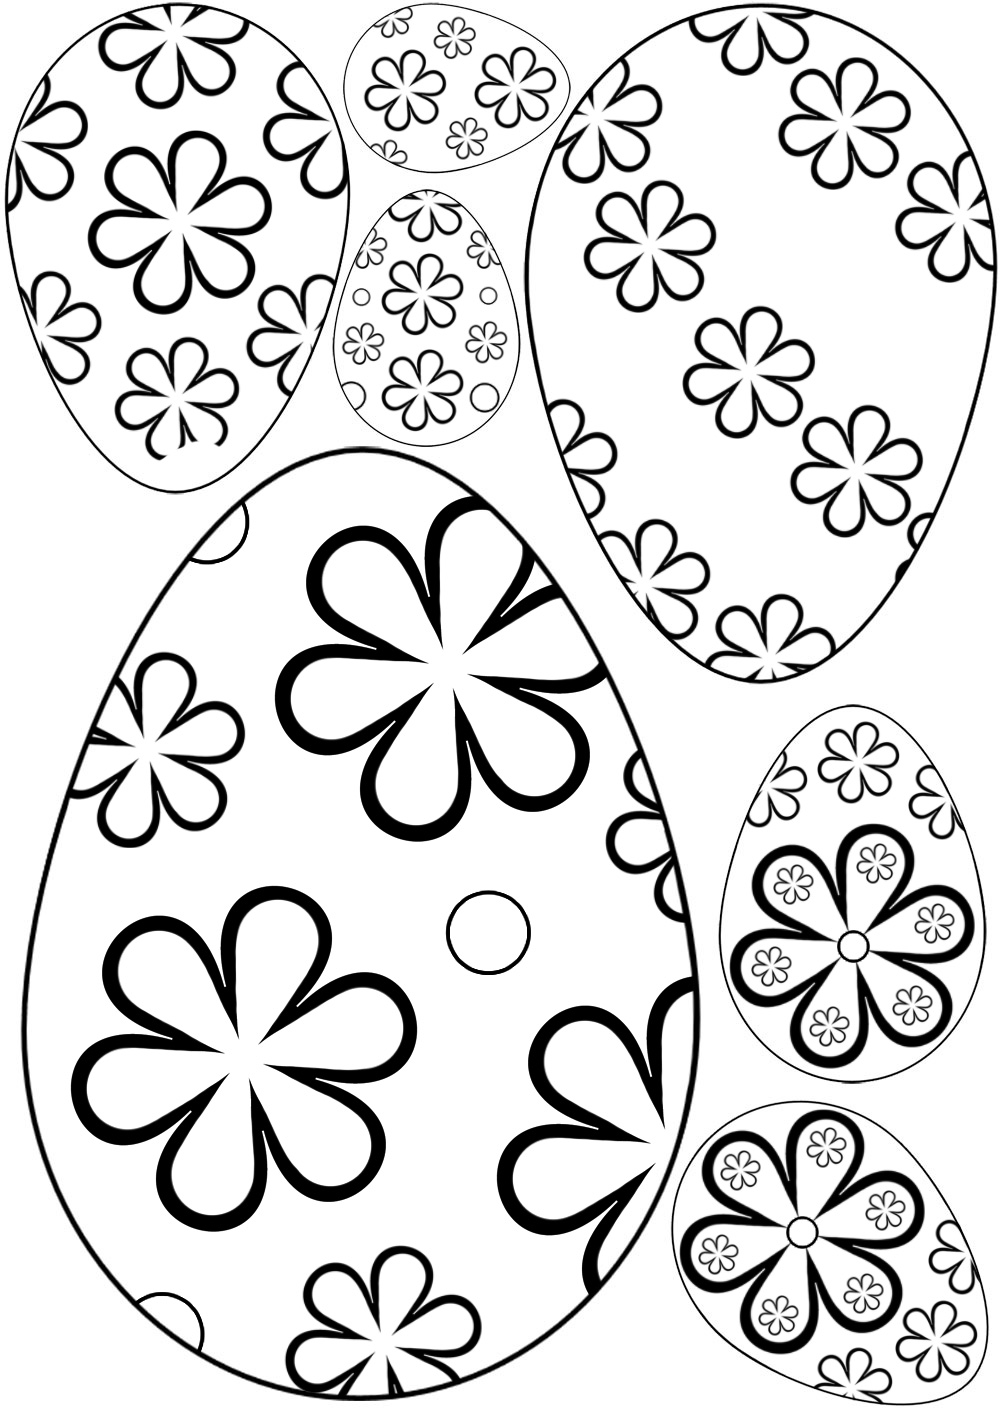 Flower Patterned Easter Eggs | Rooftop Post Printables